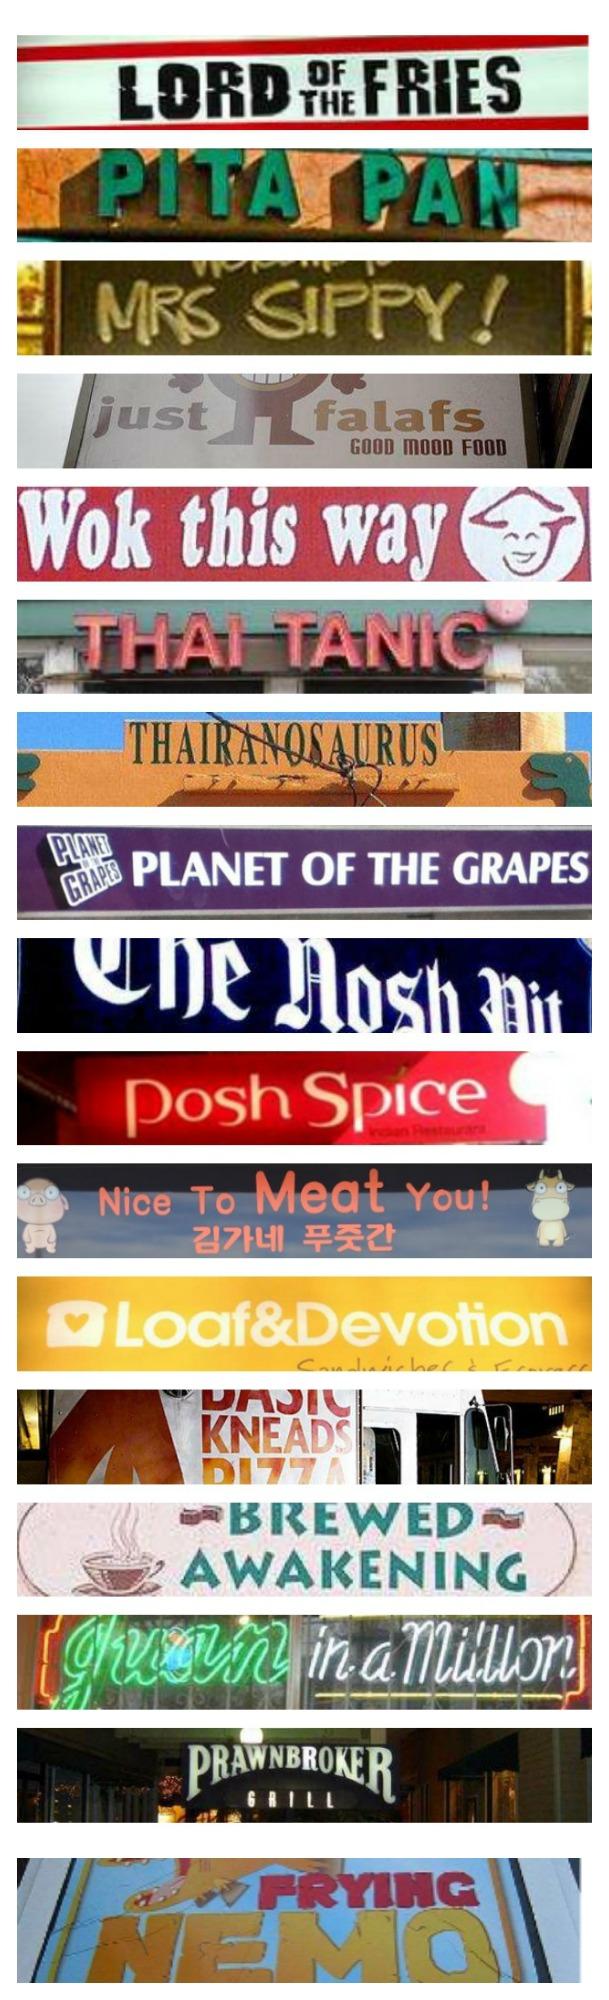 47 punny restaurant names